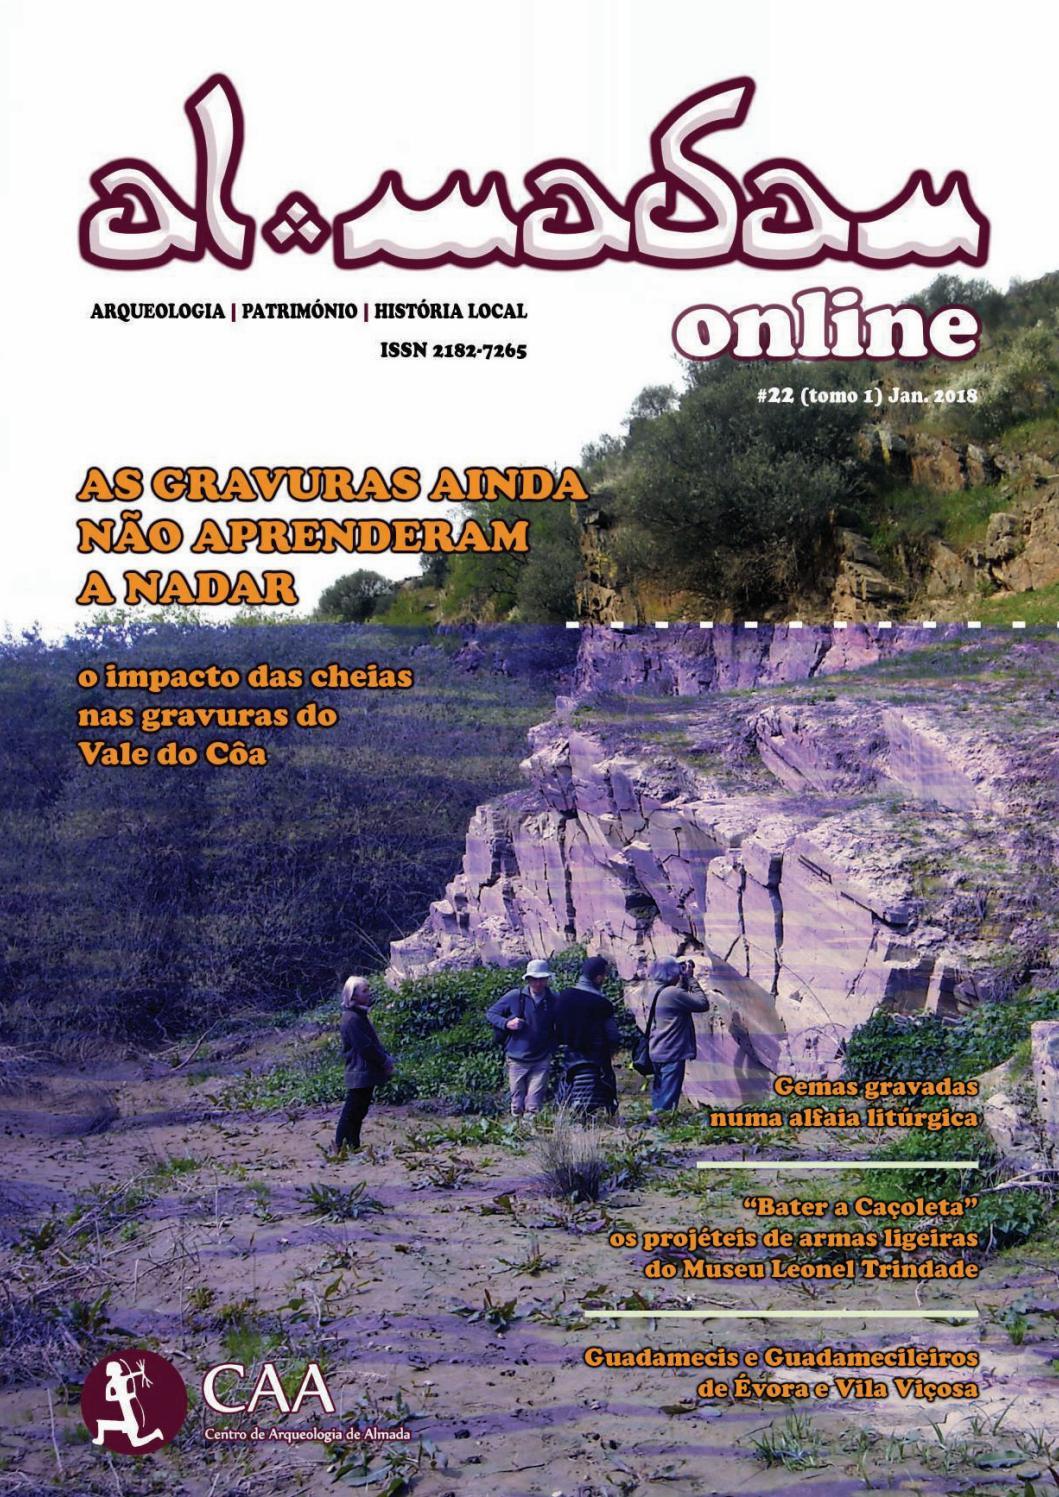 dacea2aa2a Al-Madan Online 22-1 by Al-Madan Online - issuu